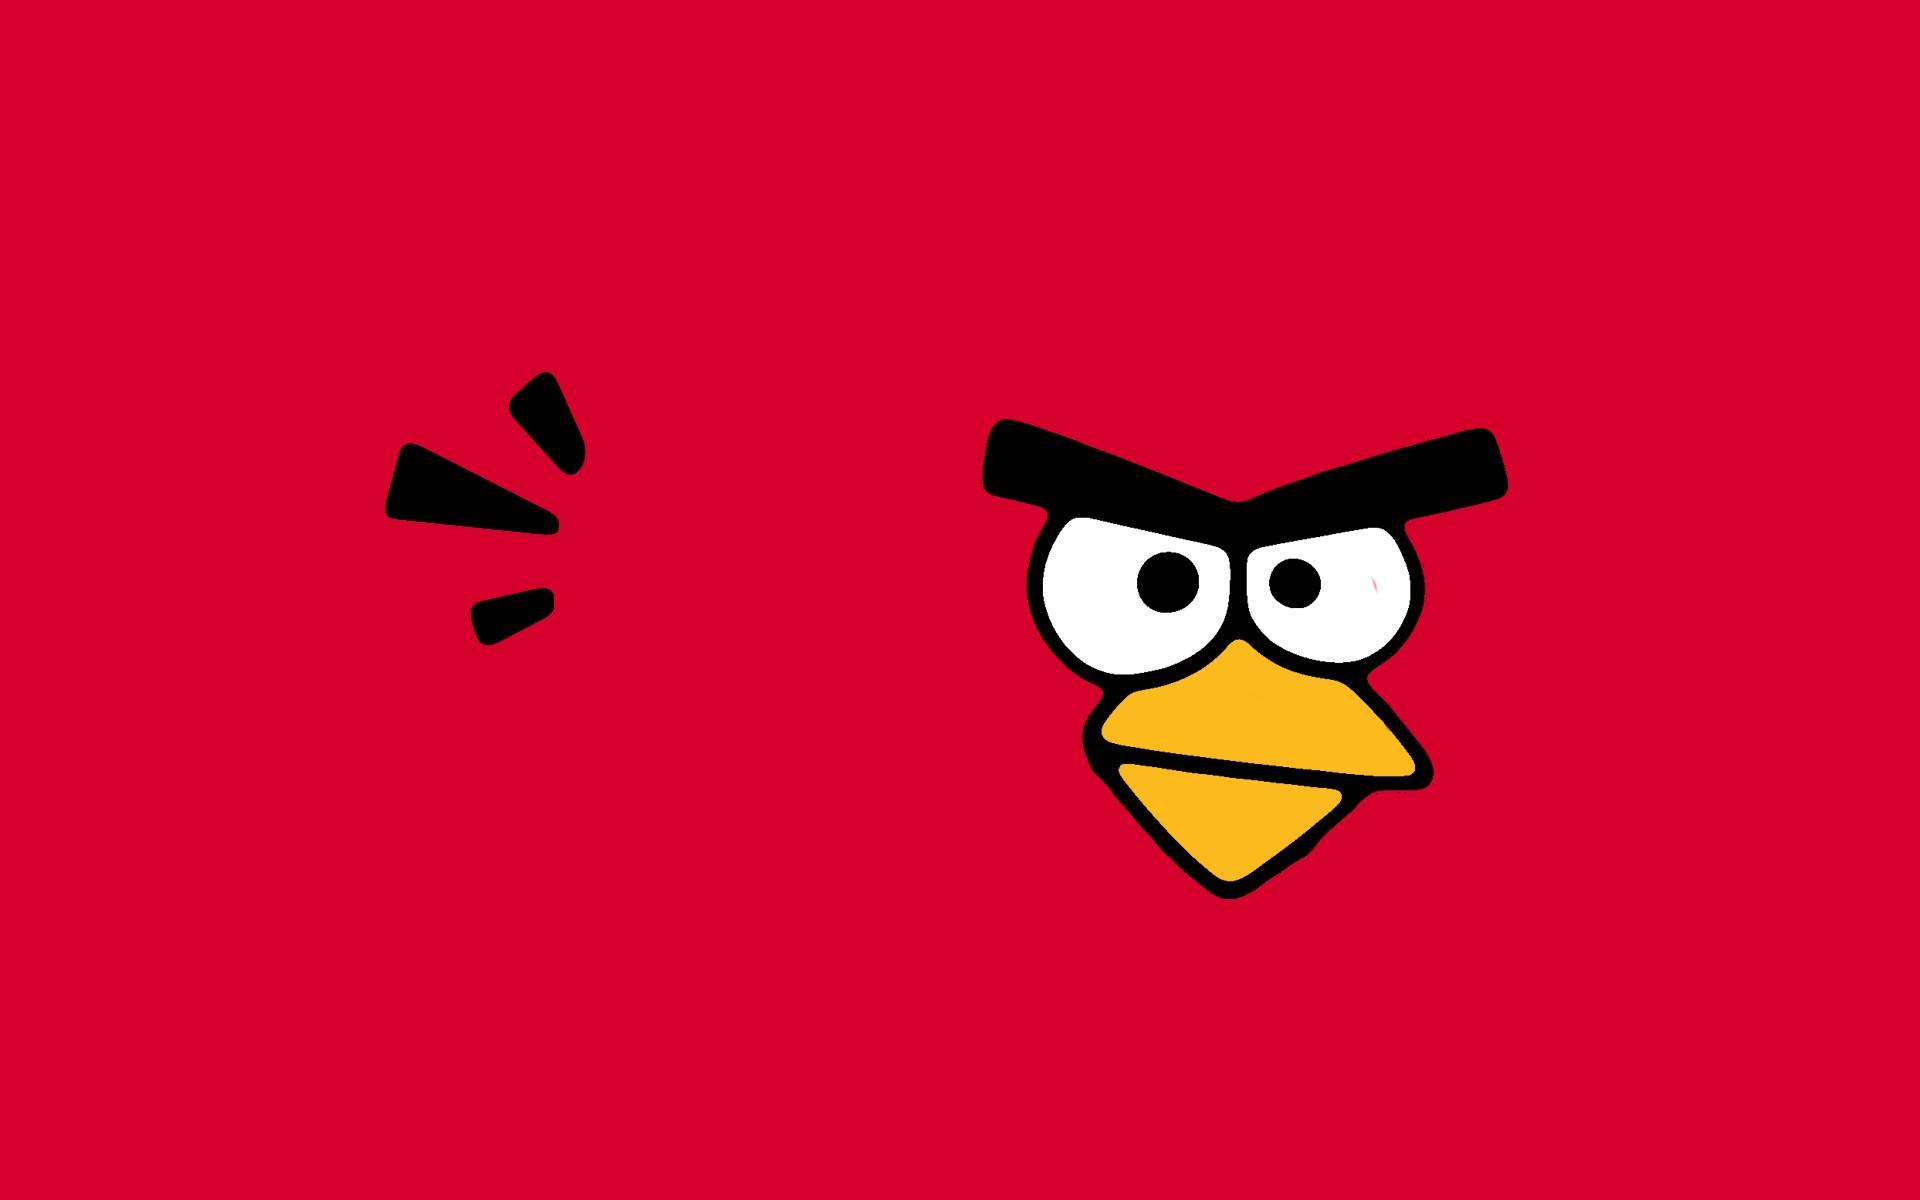 Angrybirds Francescanatale 05: Angry Birds Wallpaper HD